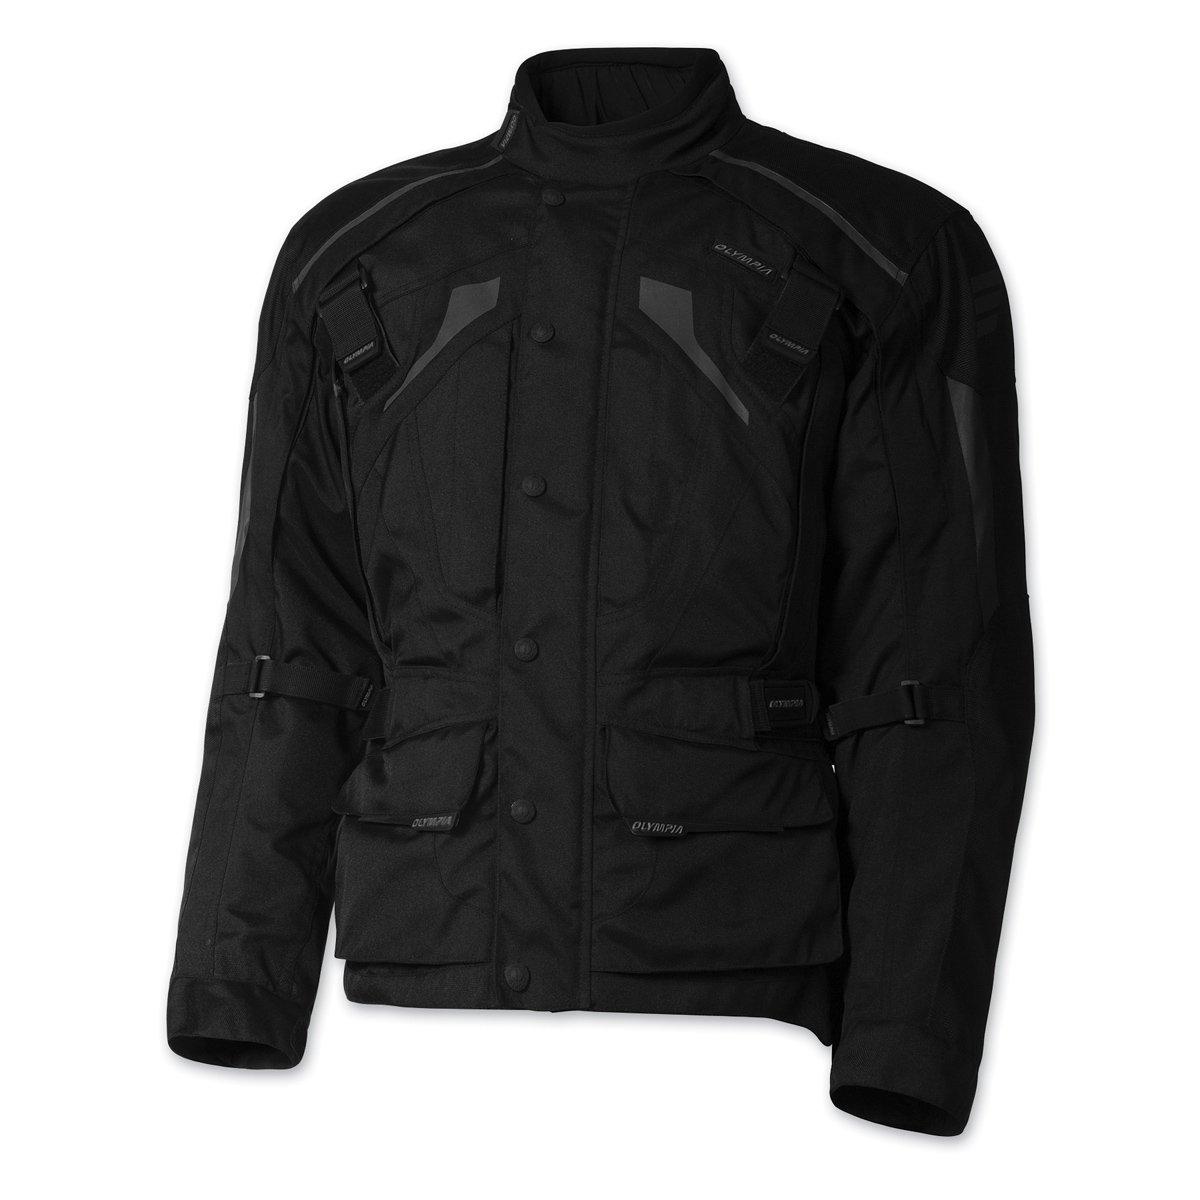 Olympia Moto Sports Men's Richmond Black Textile Jacket, XL